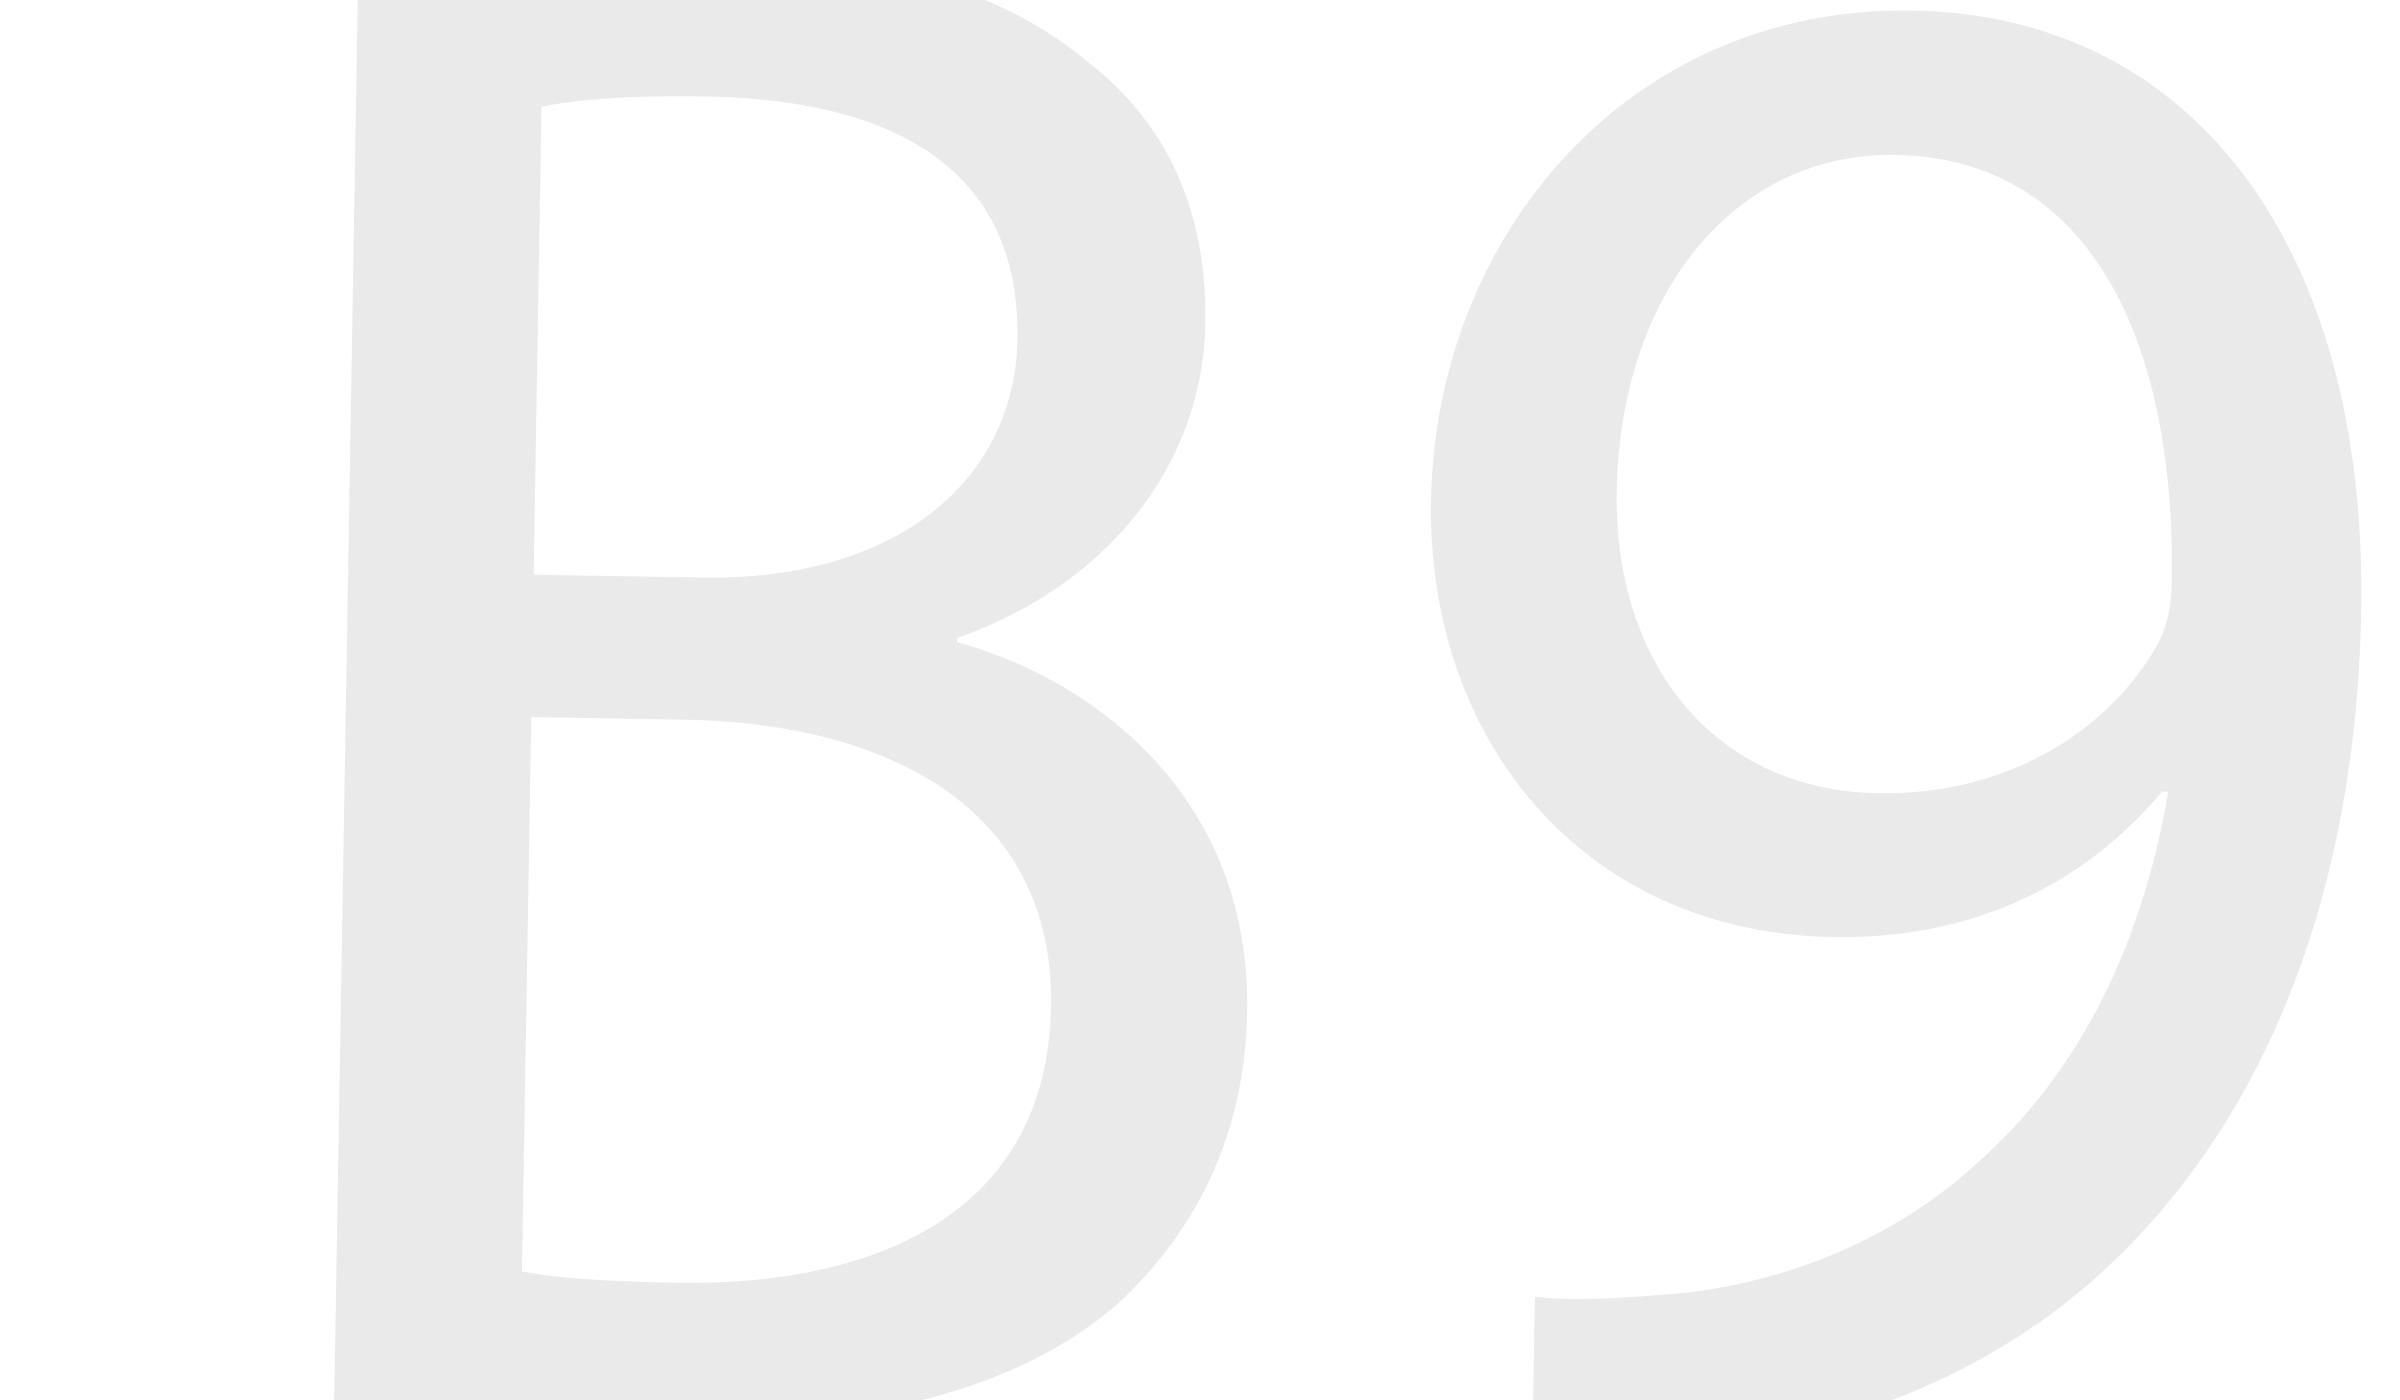 backb9